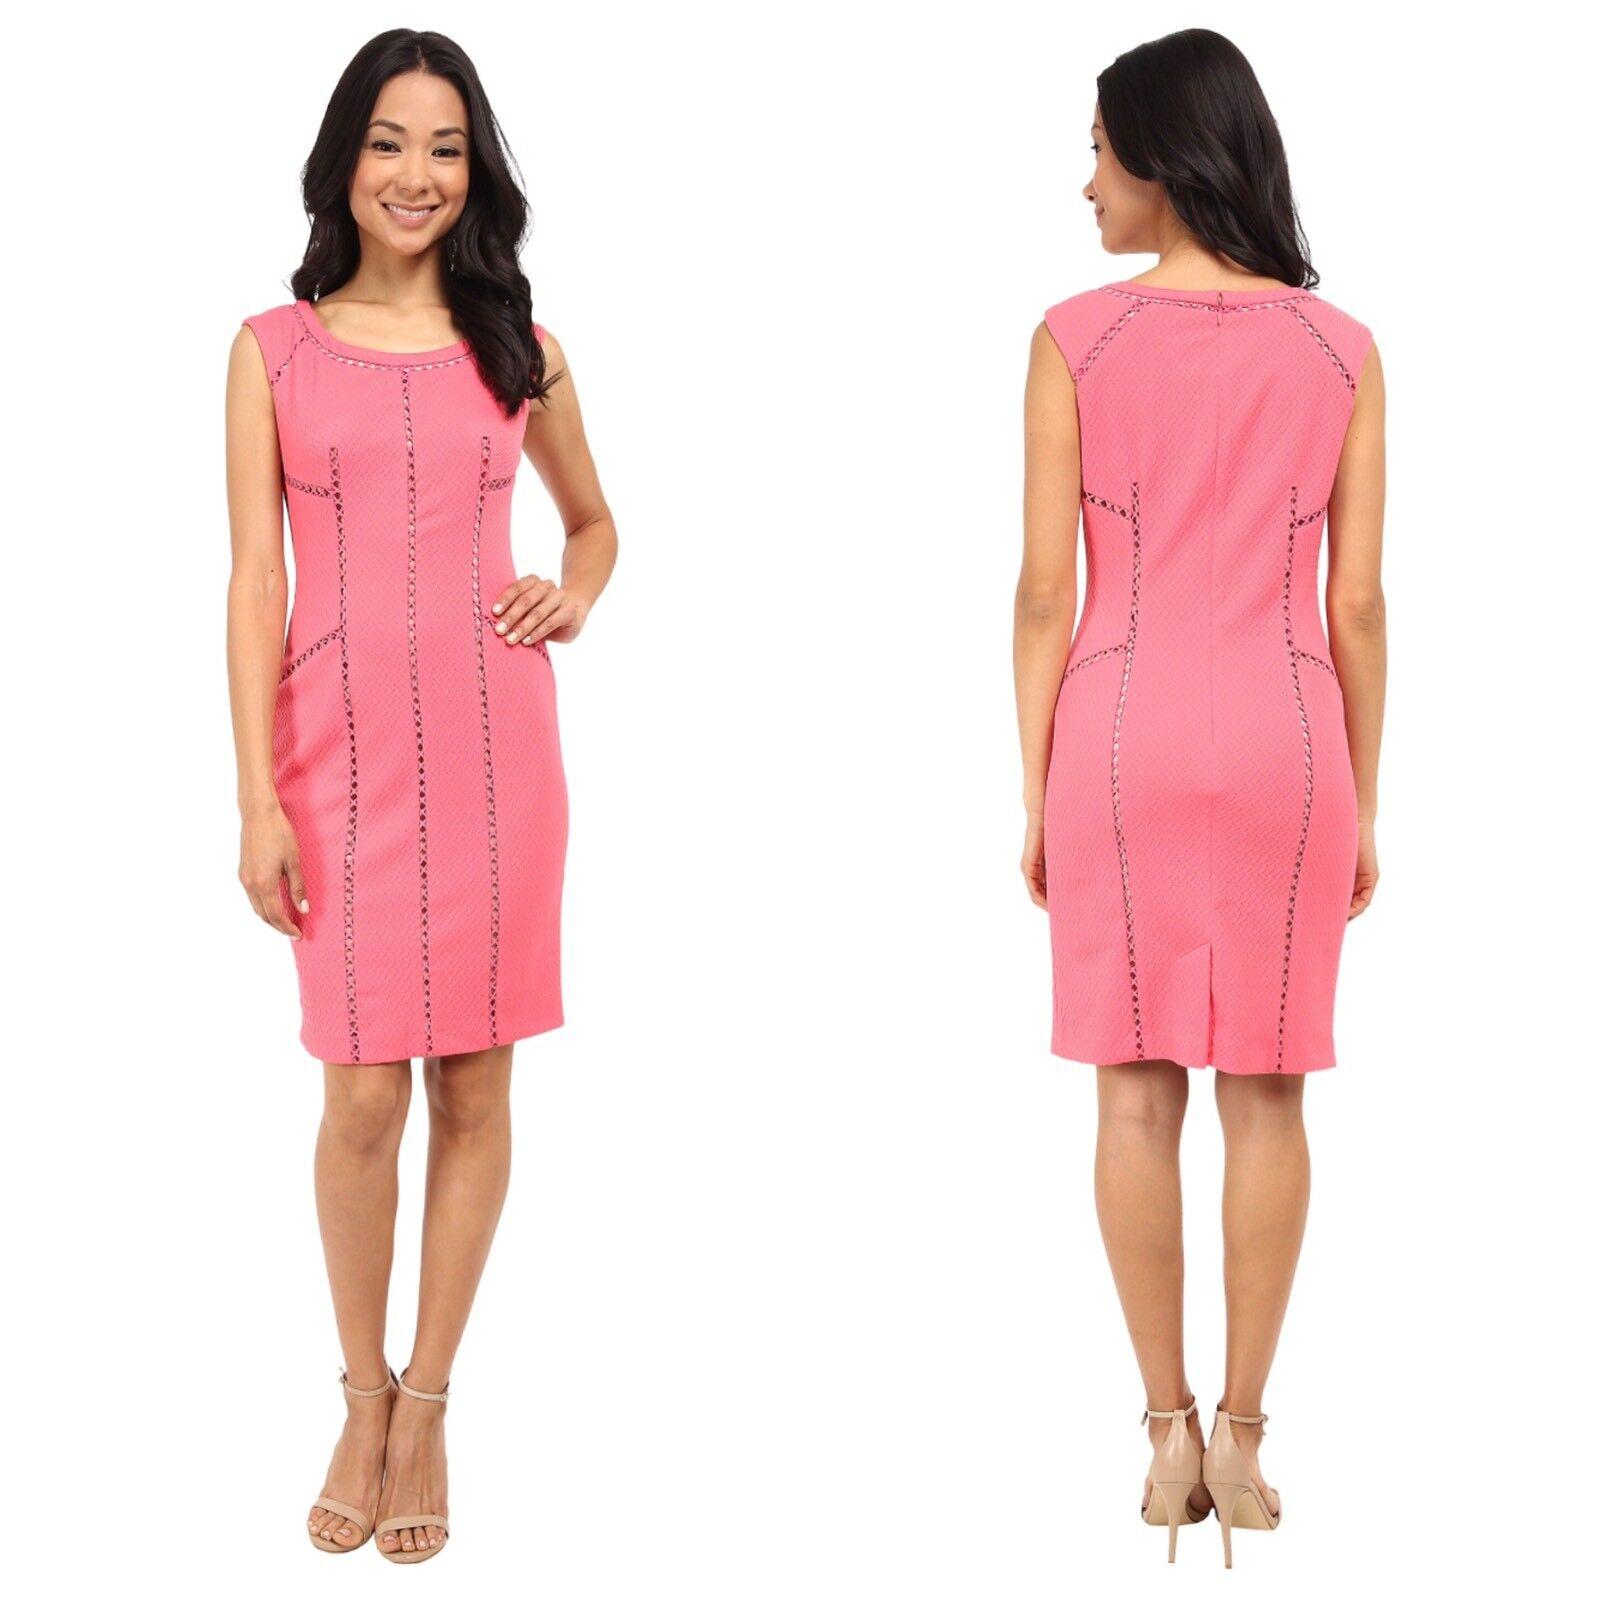 Adrianna Papell Womens Size 2 Sleeveless Splice Trim Sheath Career Dress In Pink